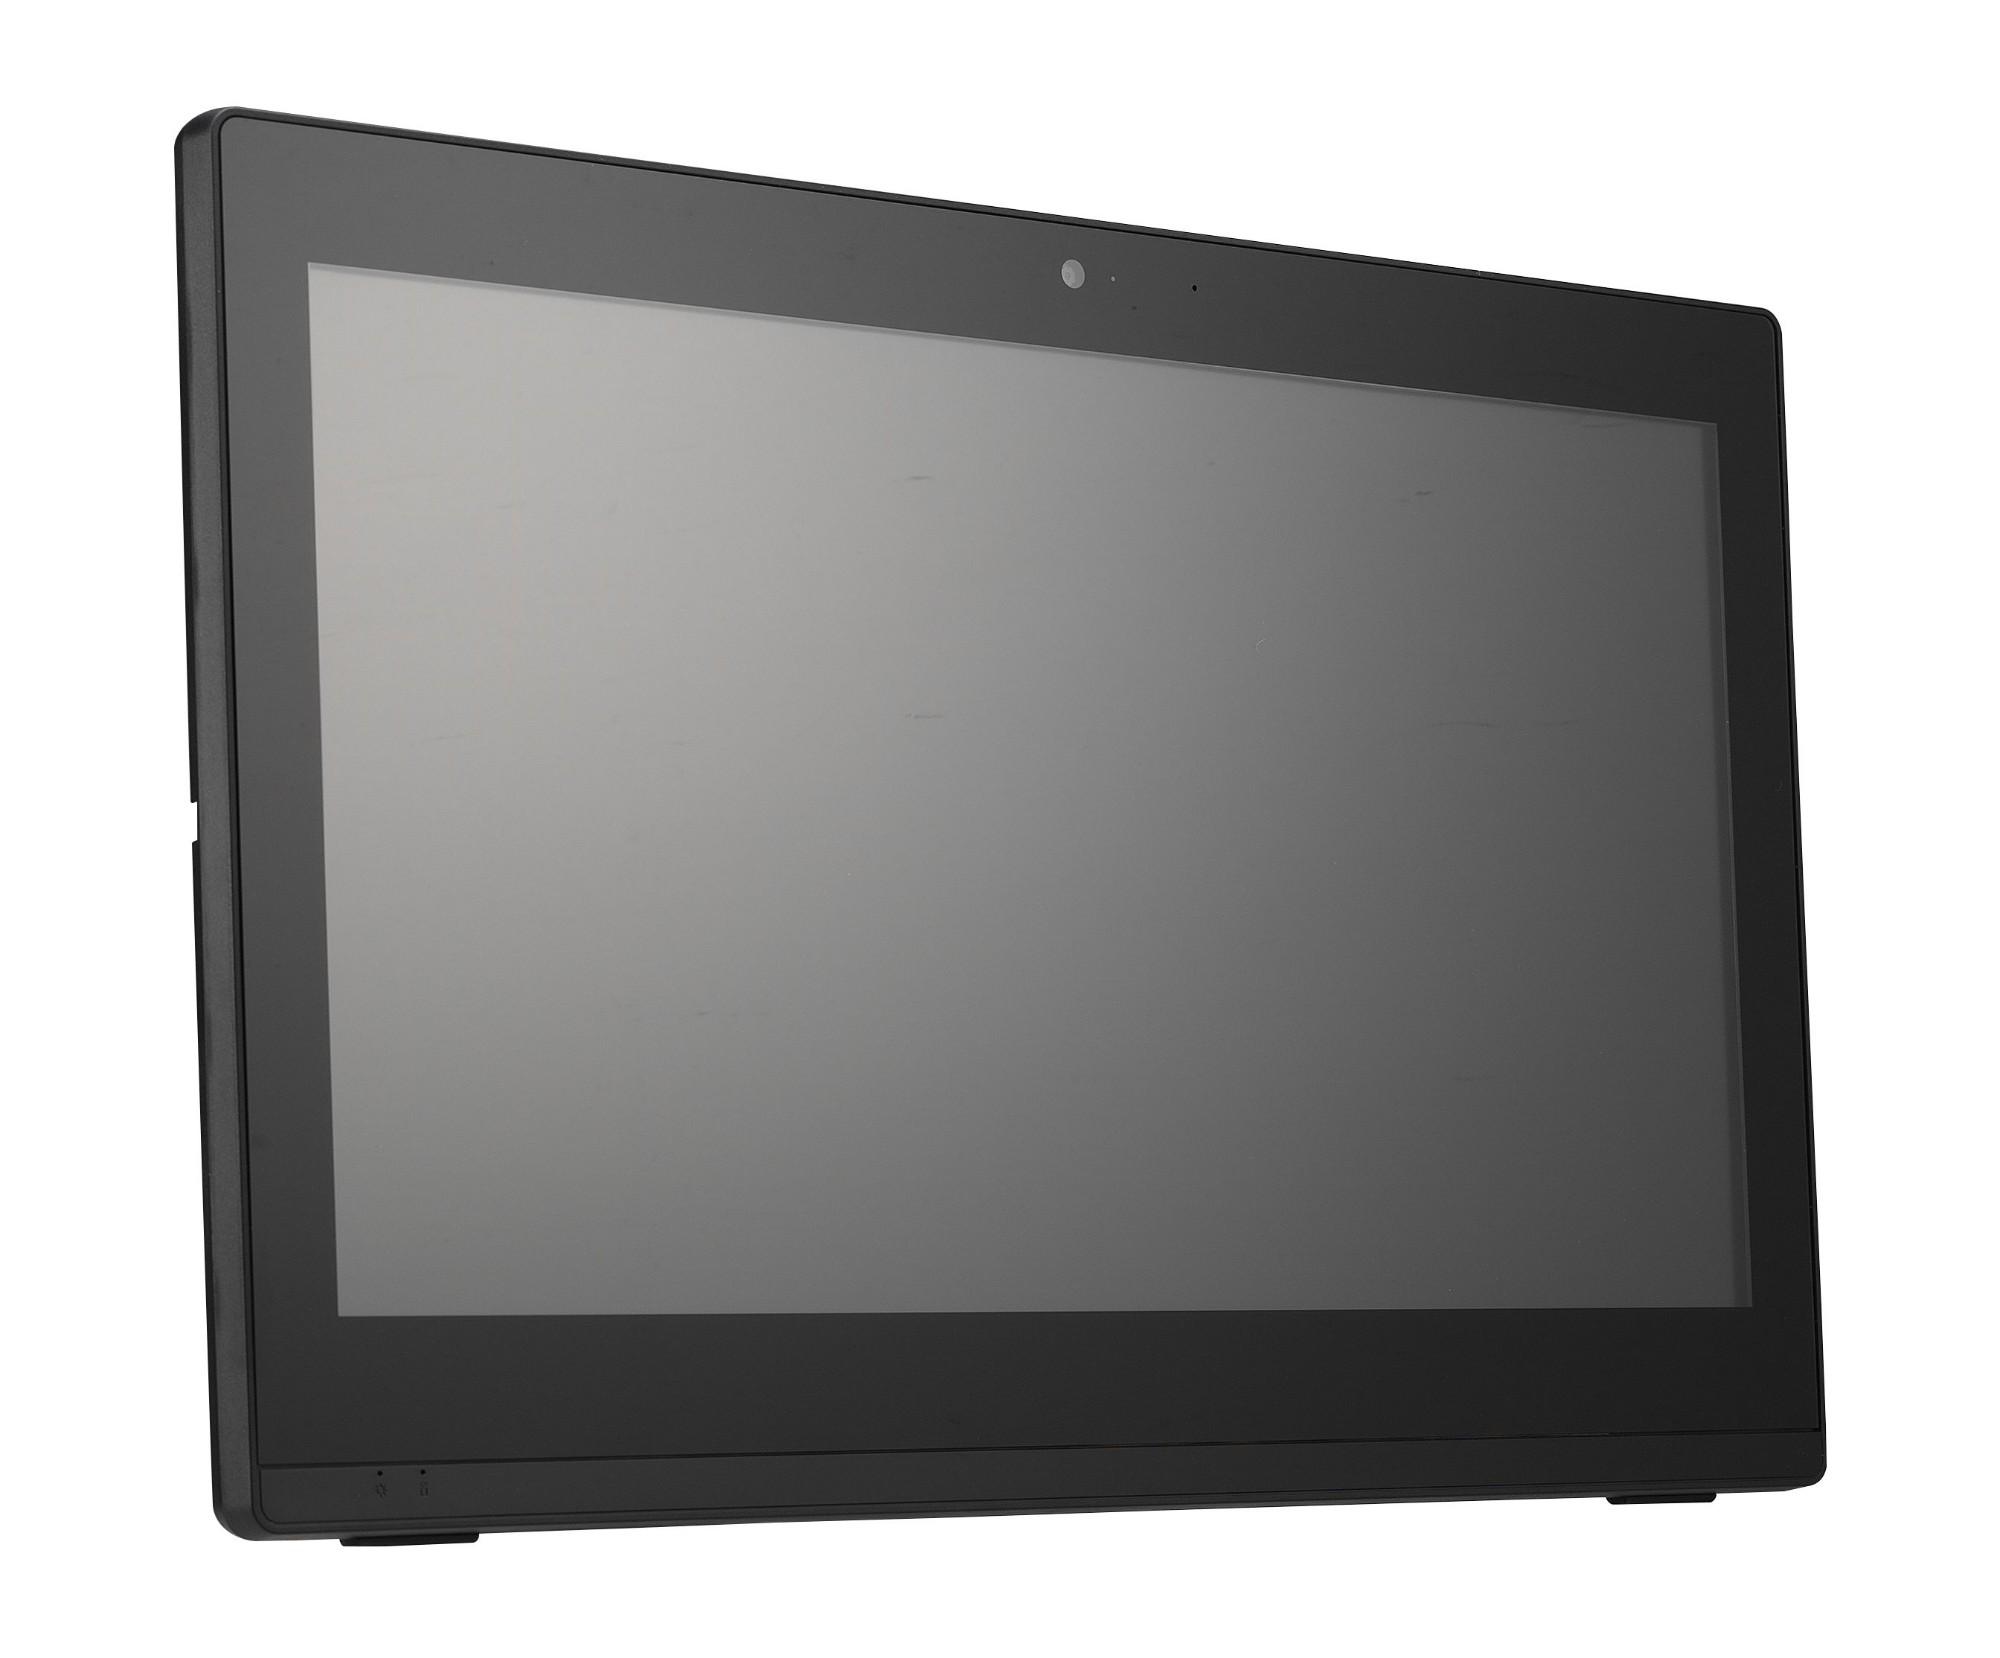 "Shuttle XPC all-in-one P90U (black) Intel SoC BGA 1356 49.5 cm (19.5"") Touchscreen 1600 x 900 pixels 3865U 1.8 GHz"